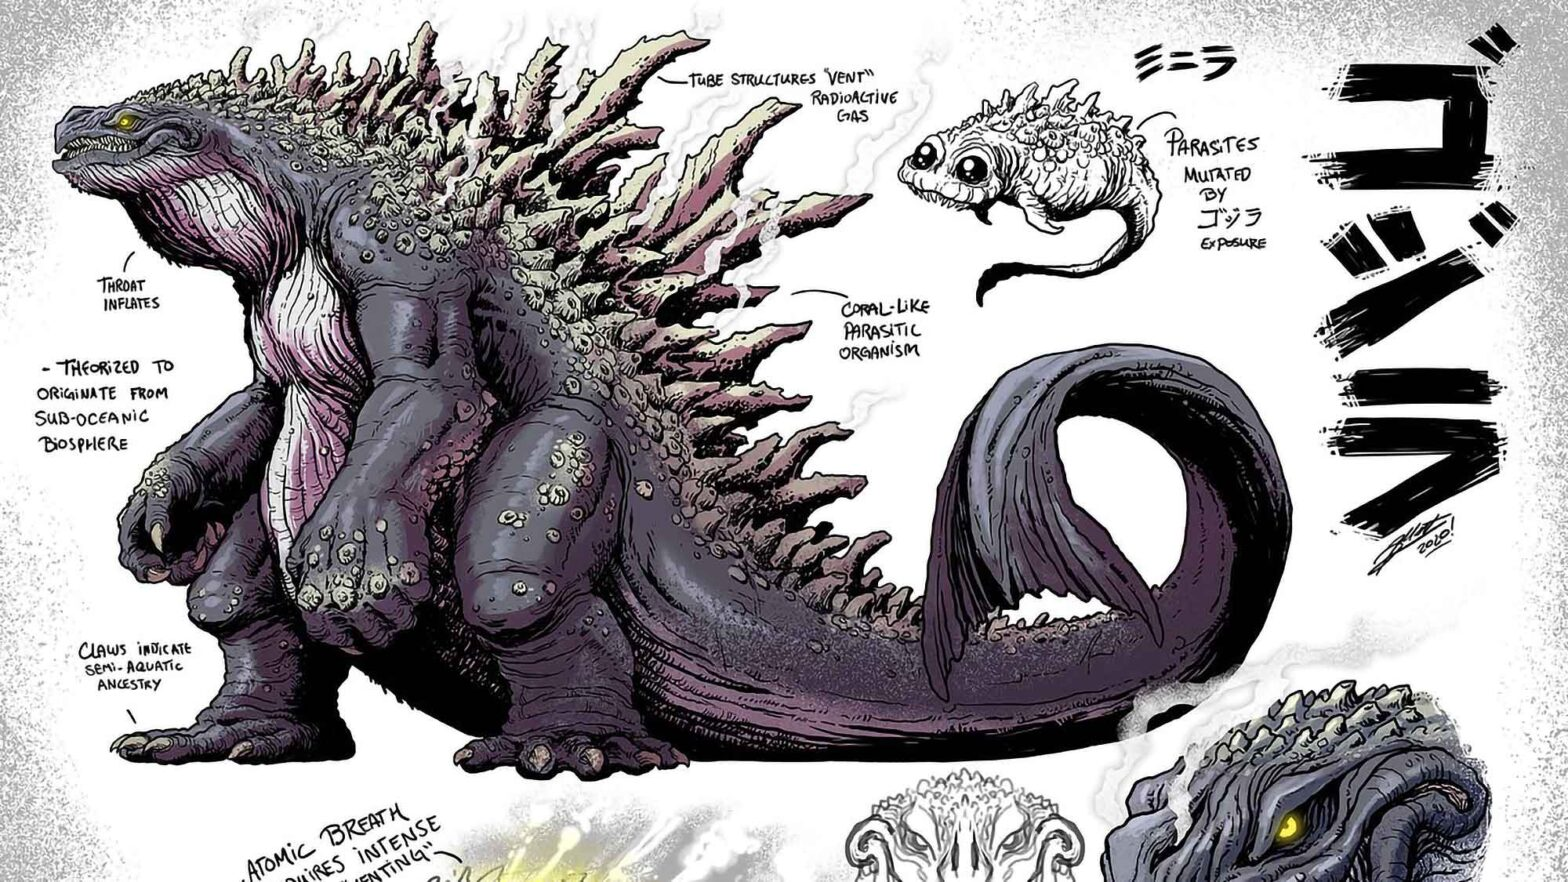 Redesigned Godzilla by Matt Frank